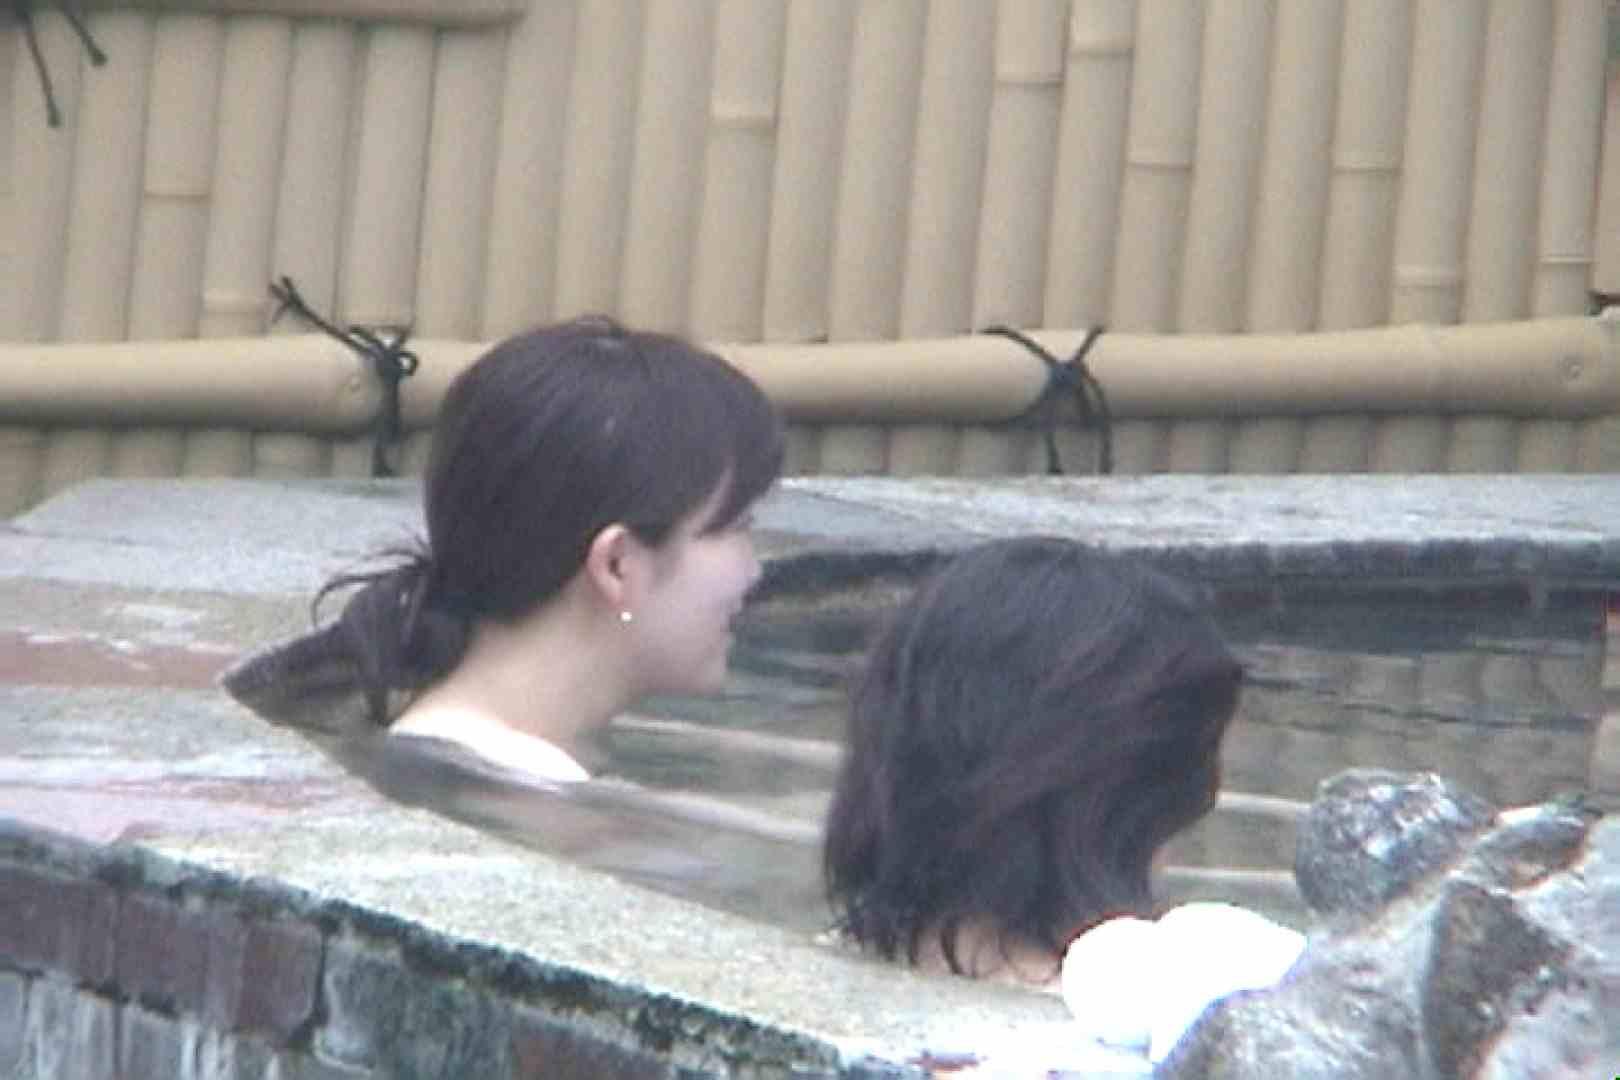 Aquaな露天風呂Vol.79【VIP限定】 盗撮 | HなOL  100pic 9